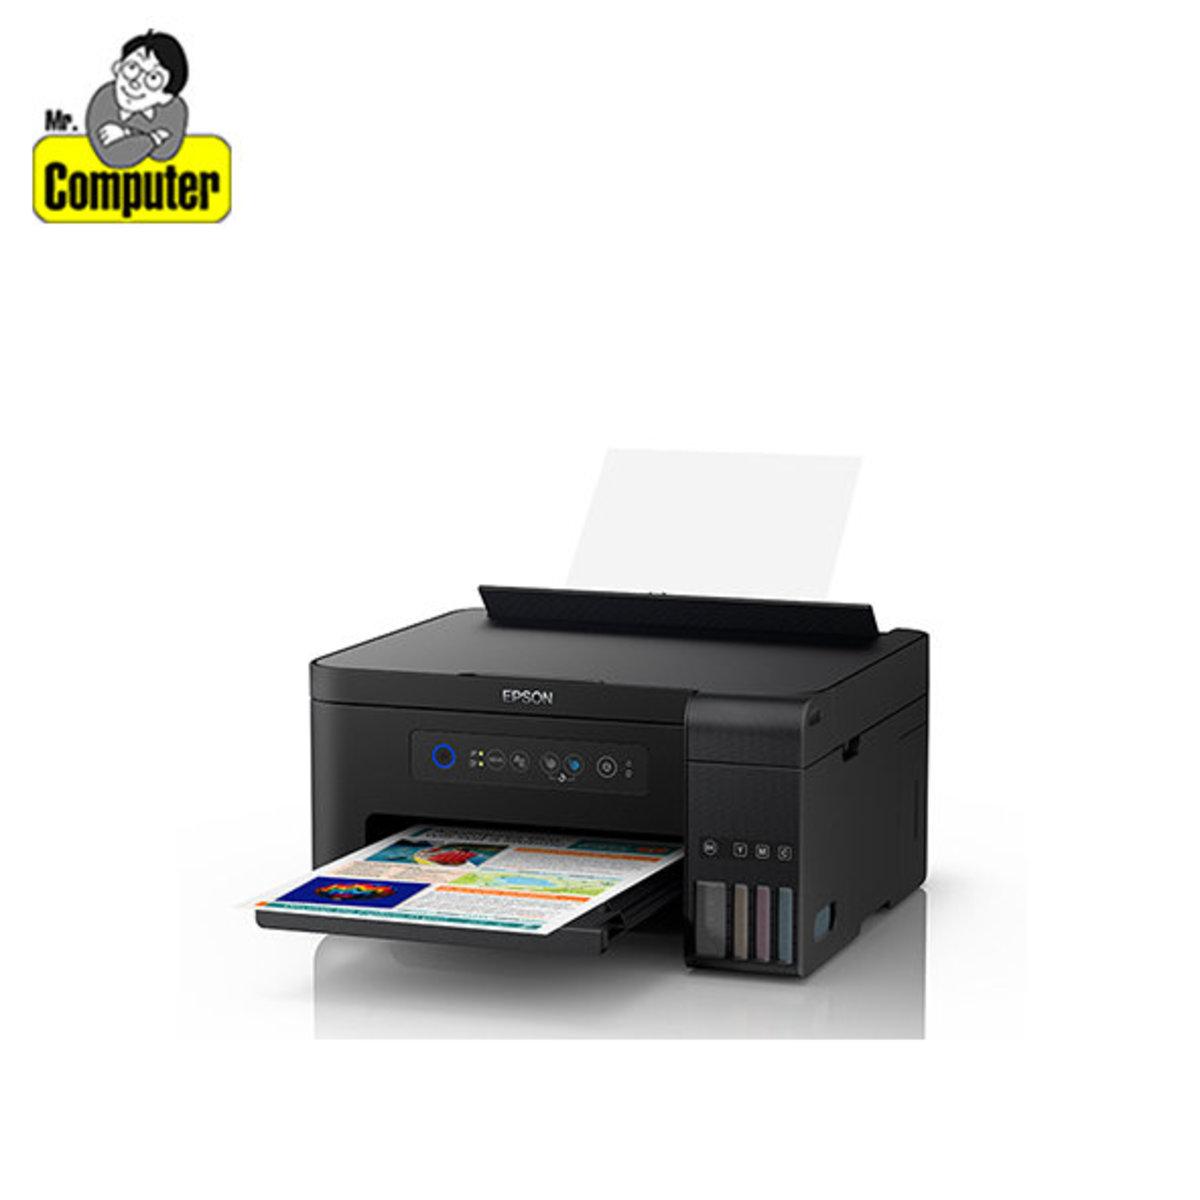 EcoTank L4150 EcoTank Color Inkjet Printer with Refill Ink Tank System